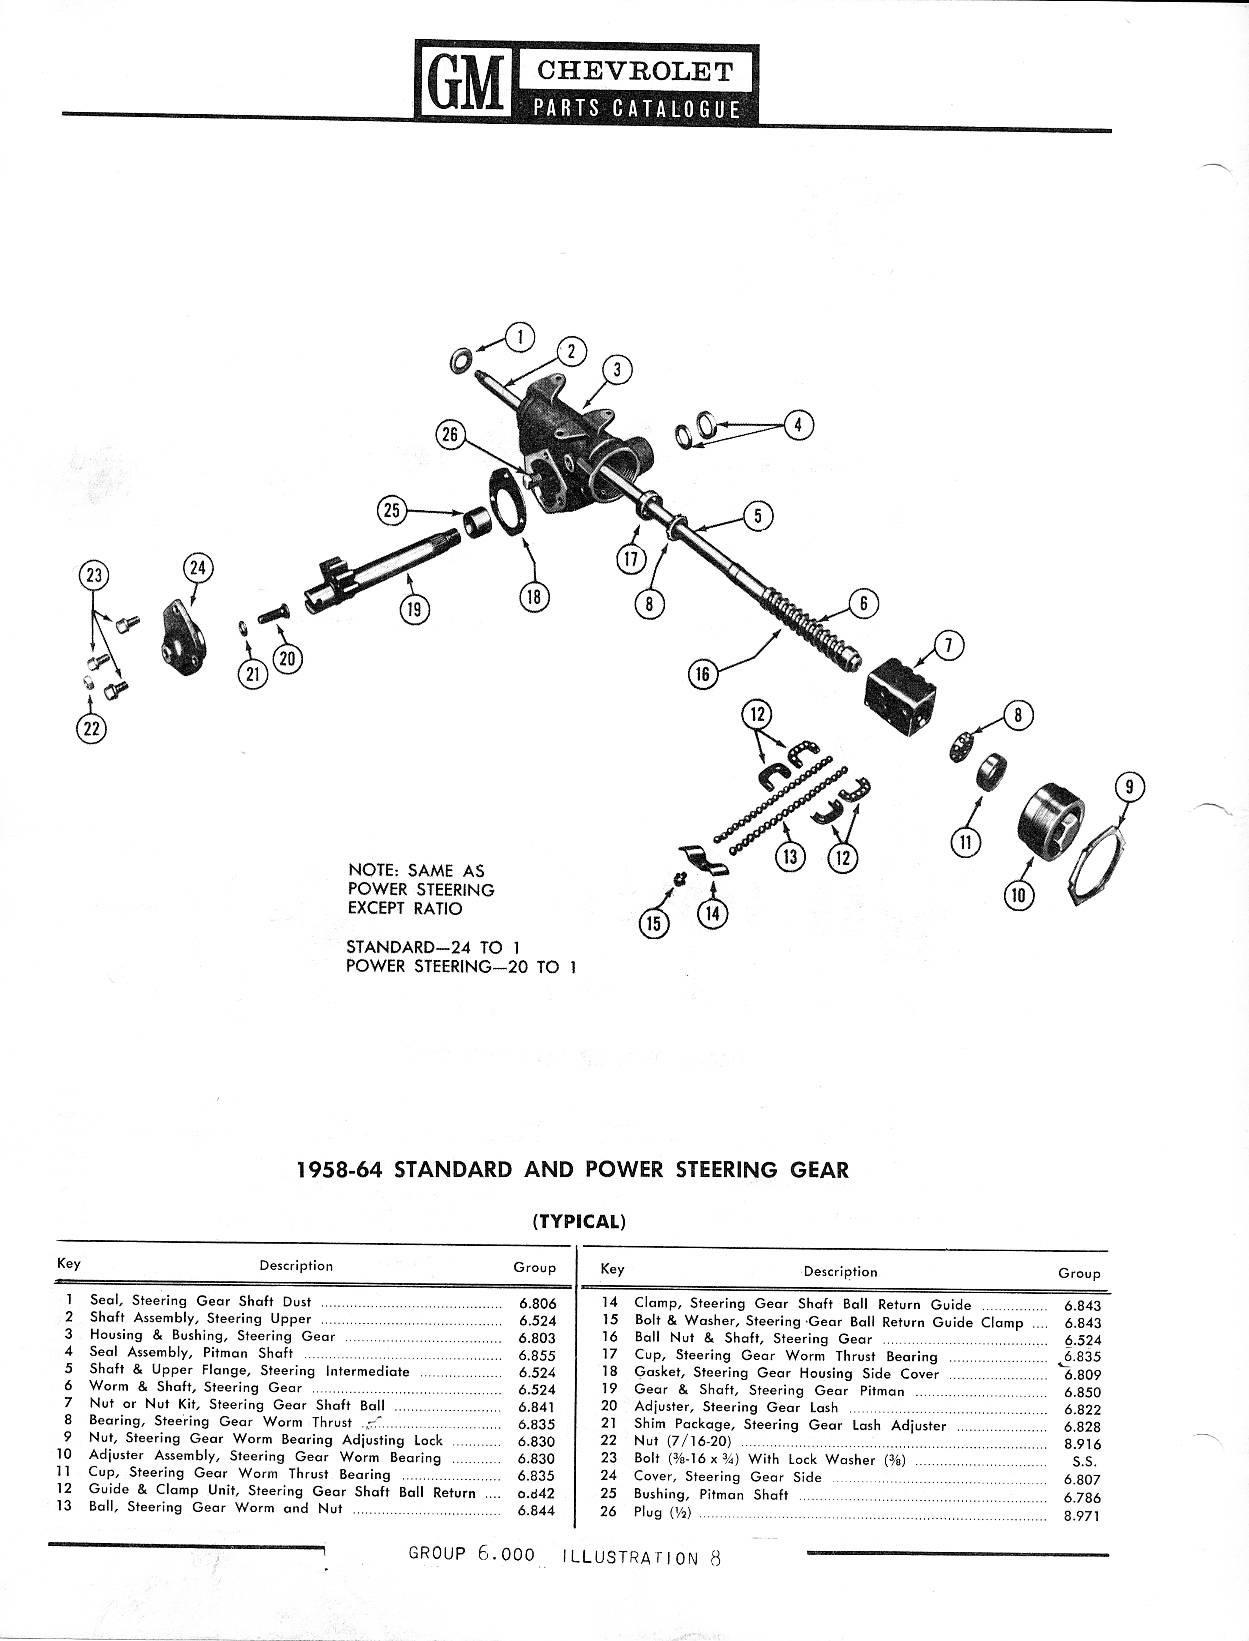 1958-1968 Chevrolet Parts Catalog / Image38.jpg